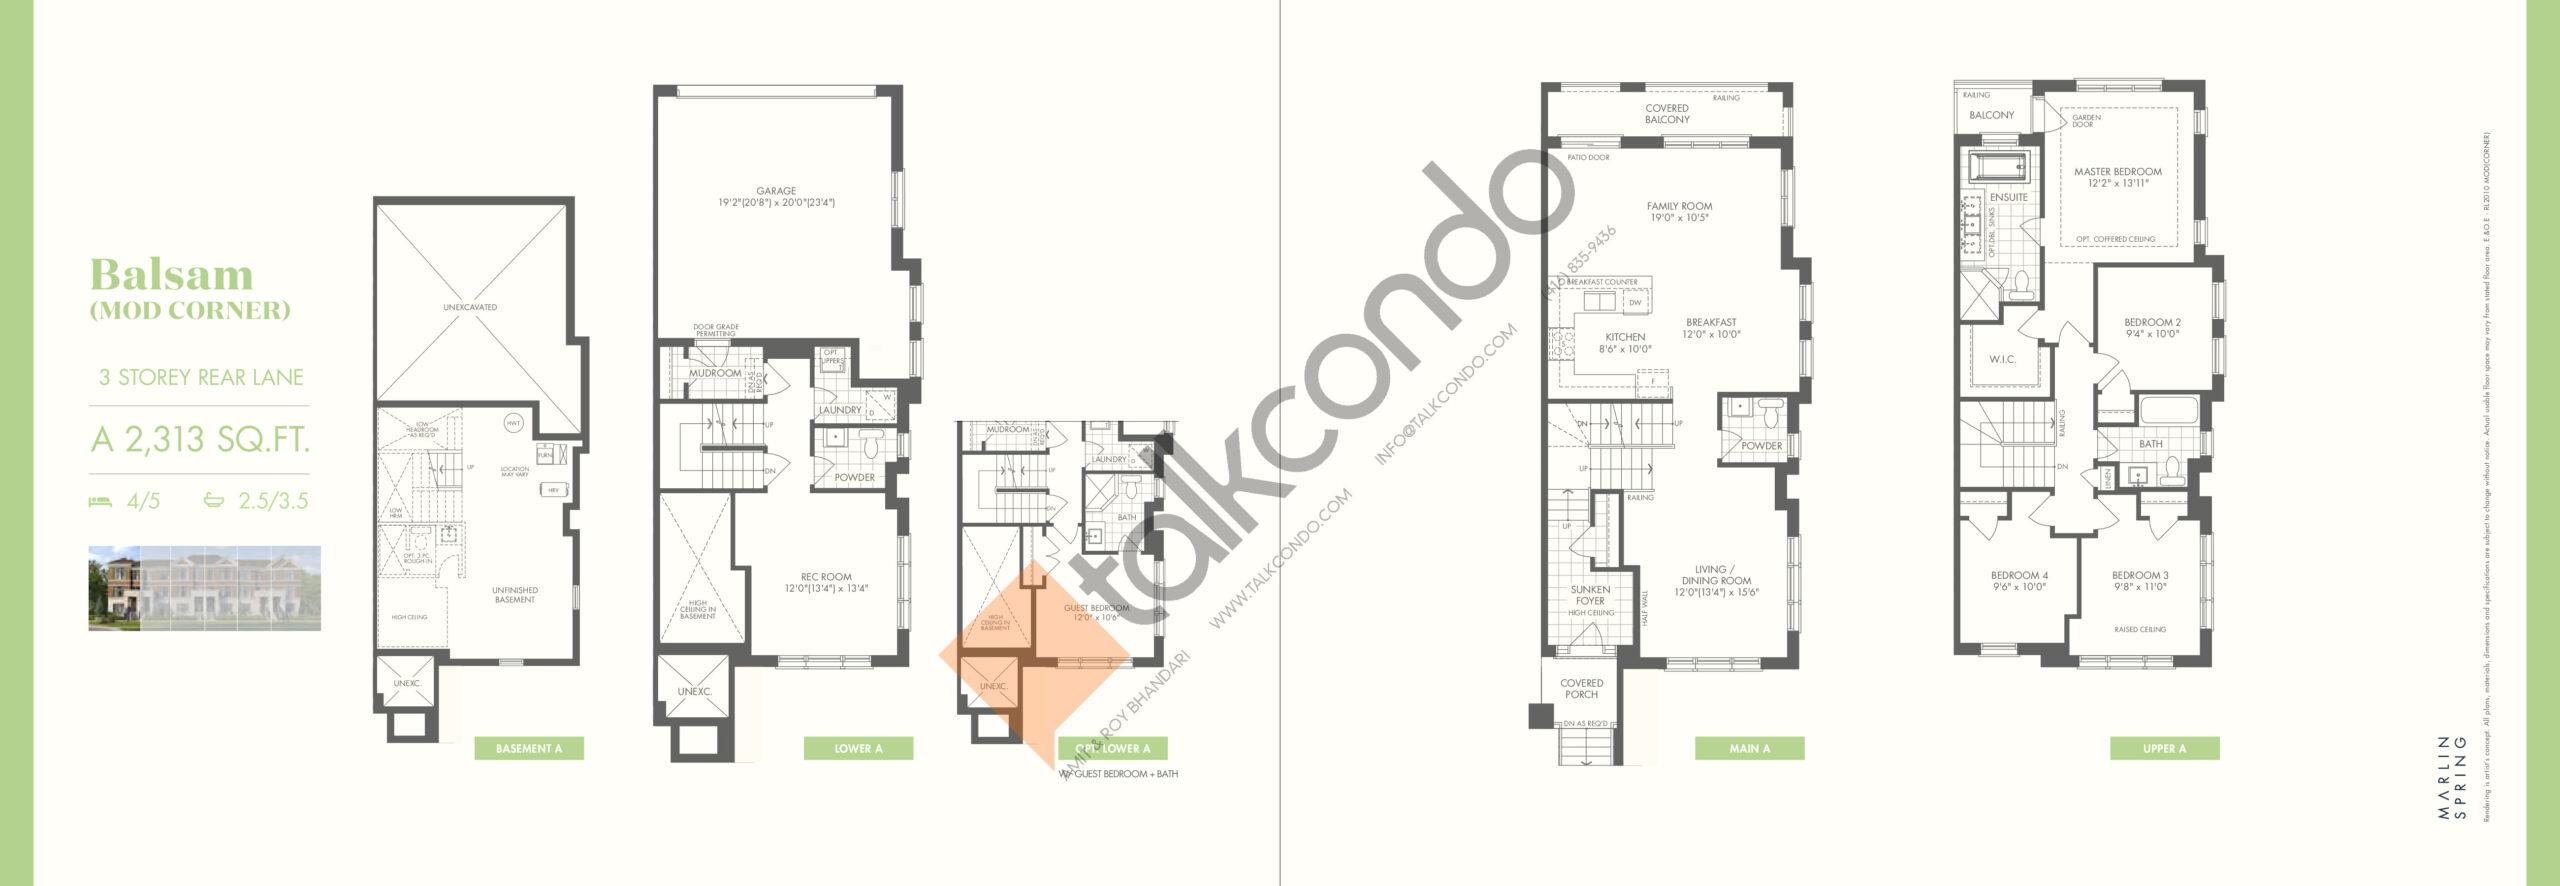 Balsam (Mod Corner) A Floor Plan at Ivylea Towns - 2313 sq.ft